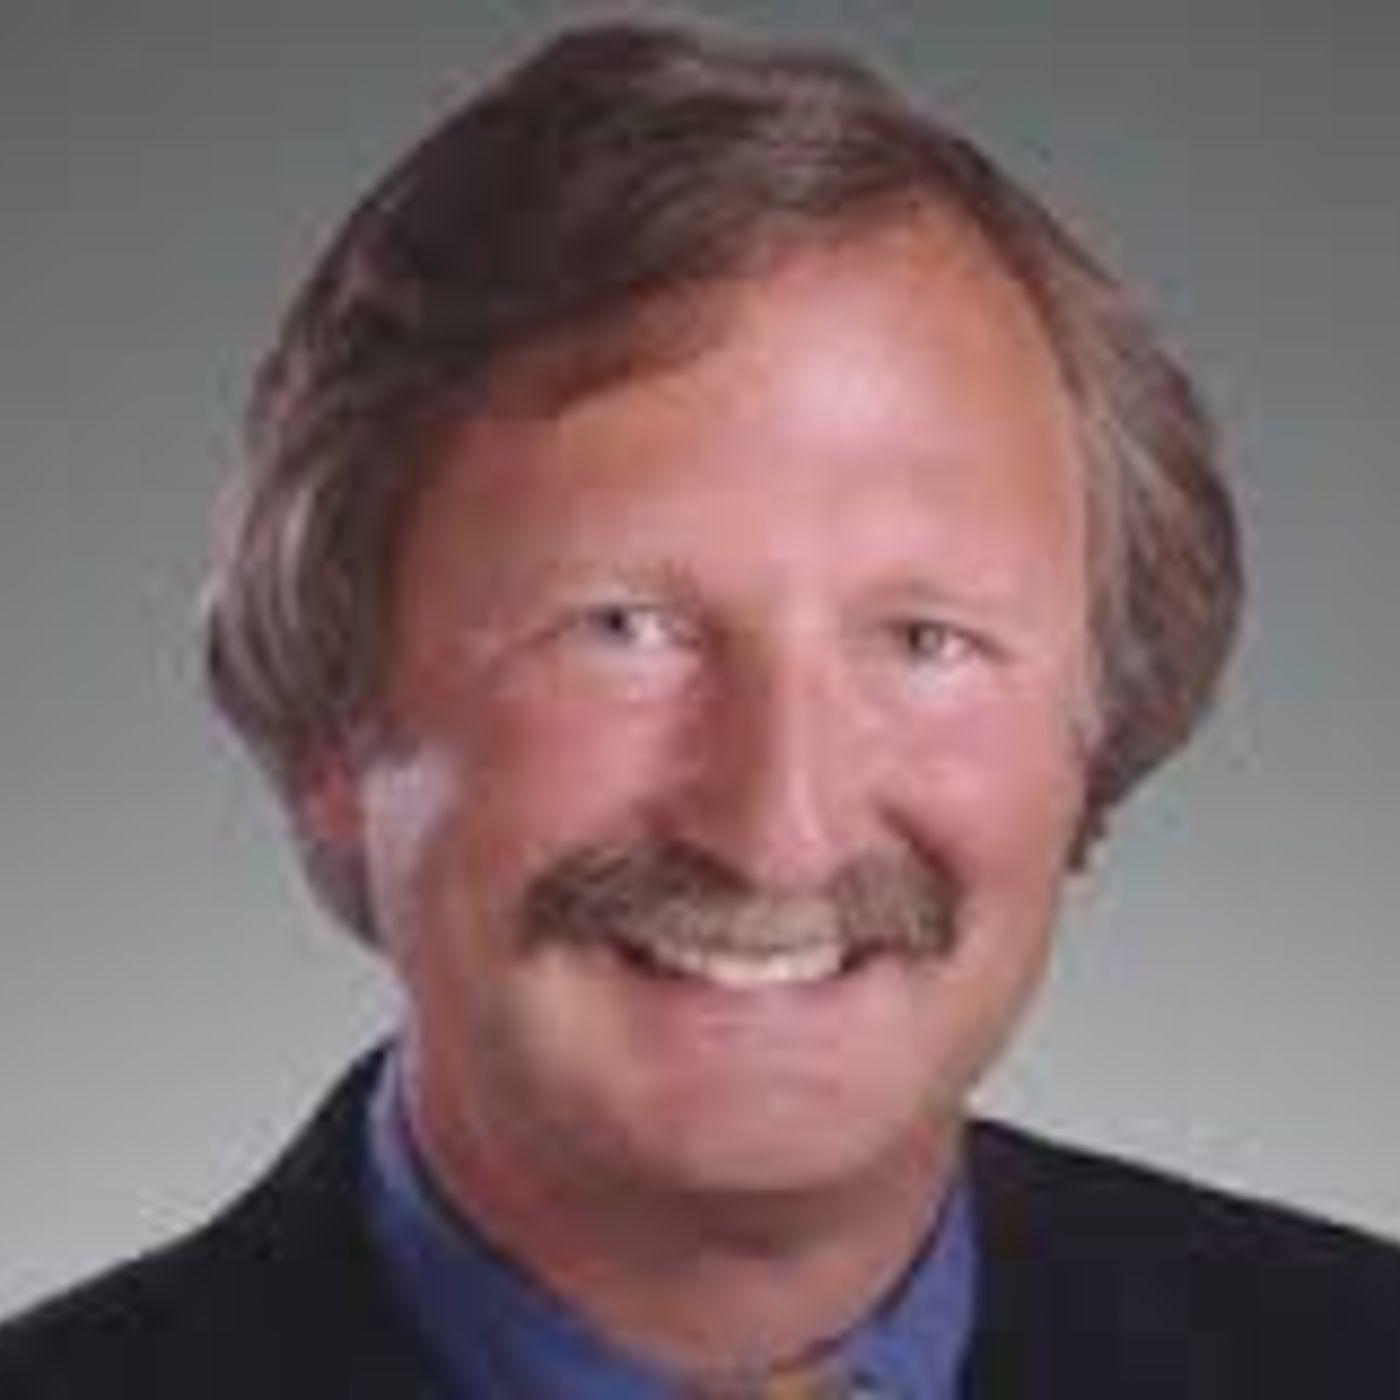 Dr. Jacob Teitelbaum Author: The Fatigue and Fibromyalgia Solution_111514